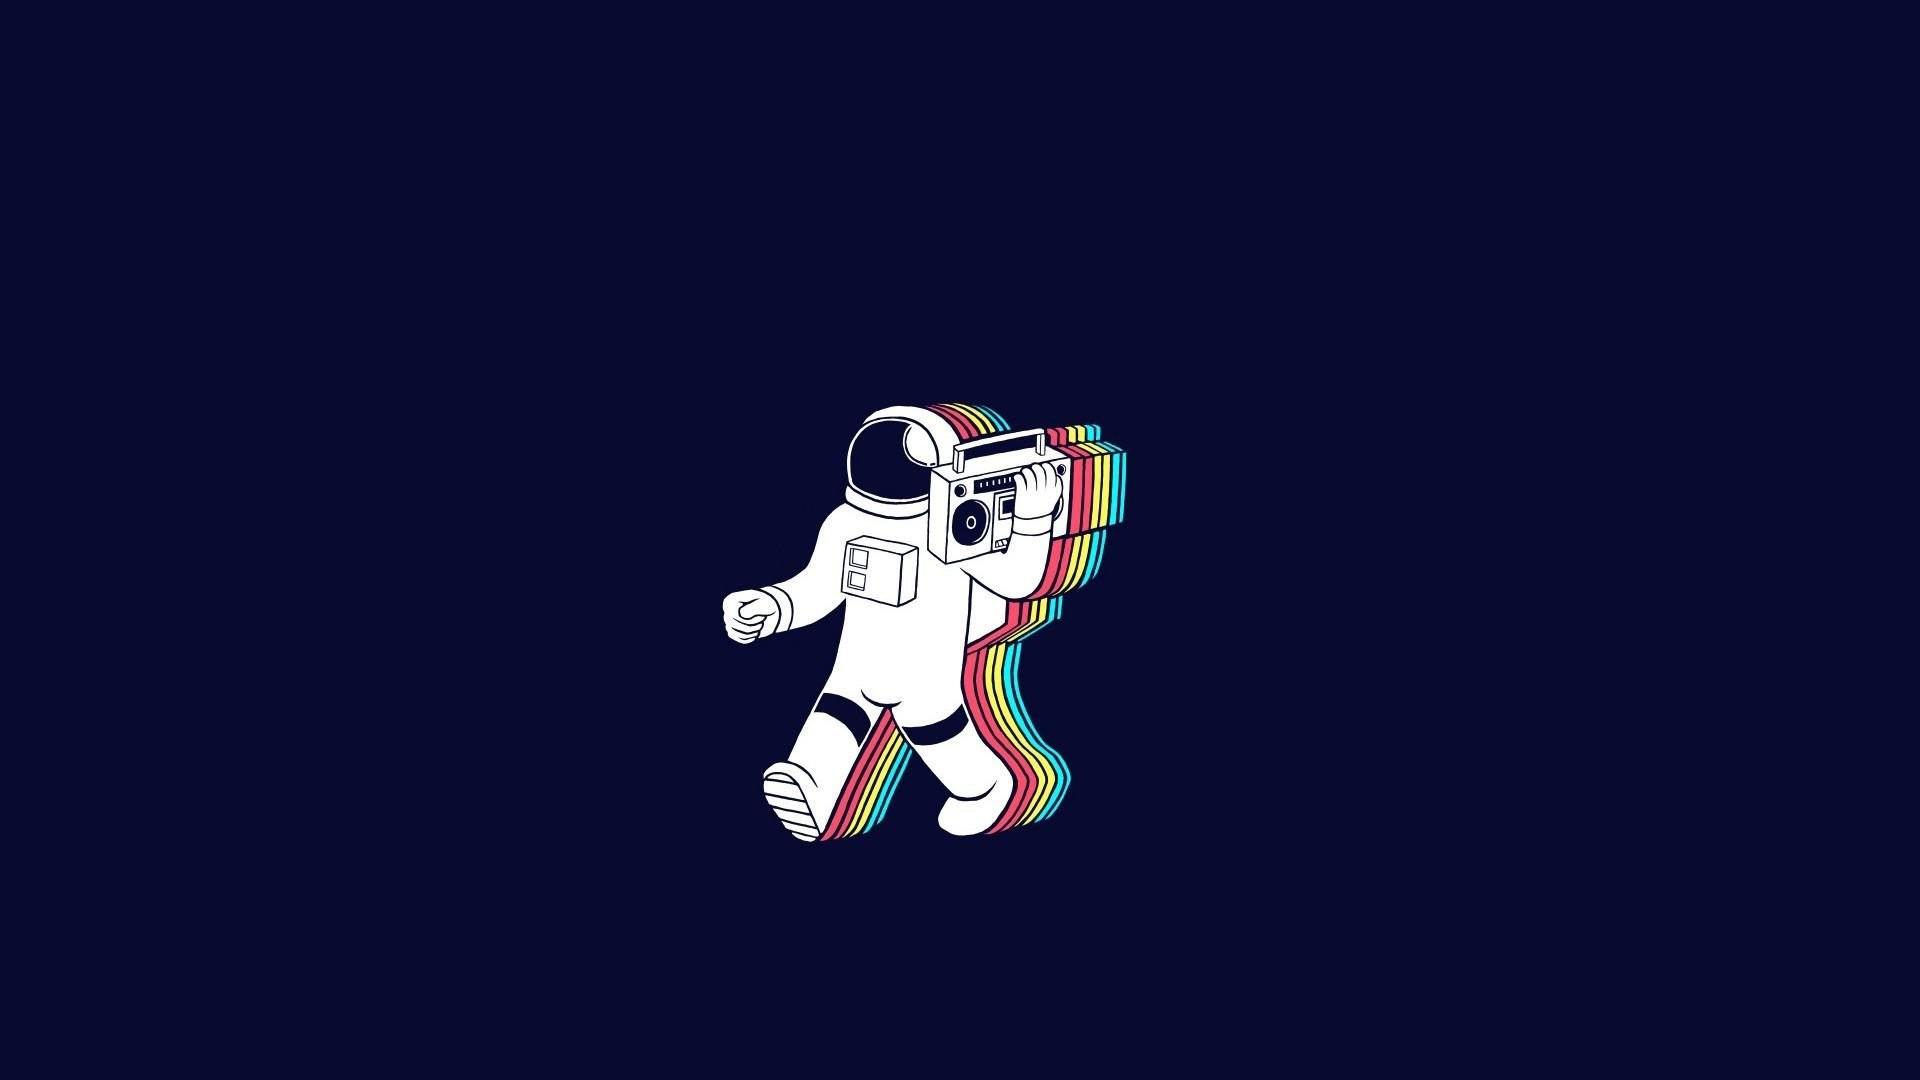 Astronaut nasa space sci-fi music mtv radio wtf wallpaper | |  633007 | WallpaperUP